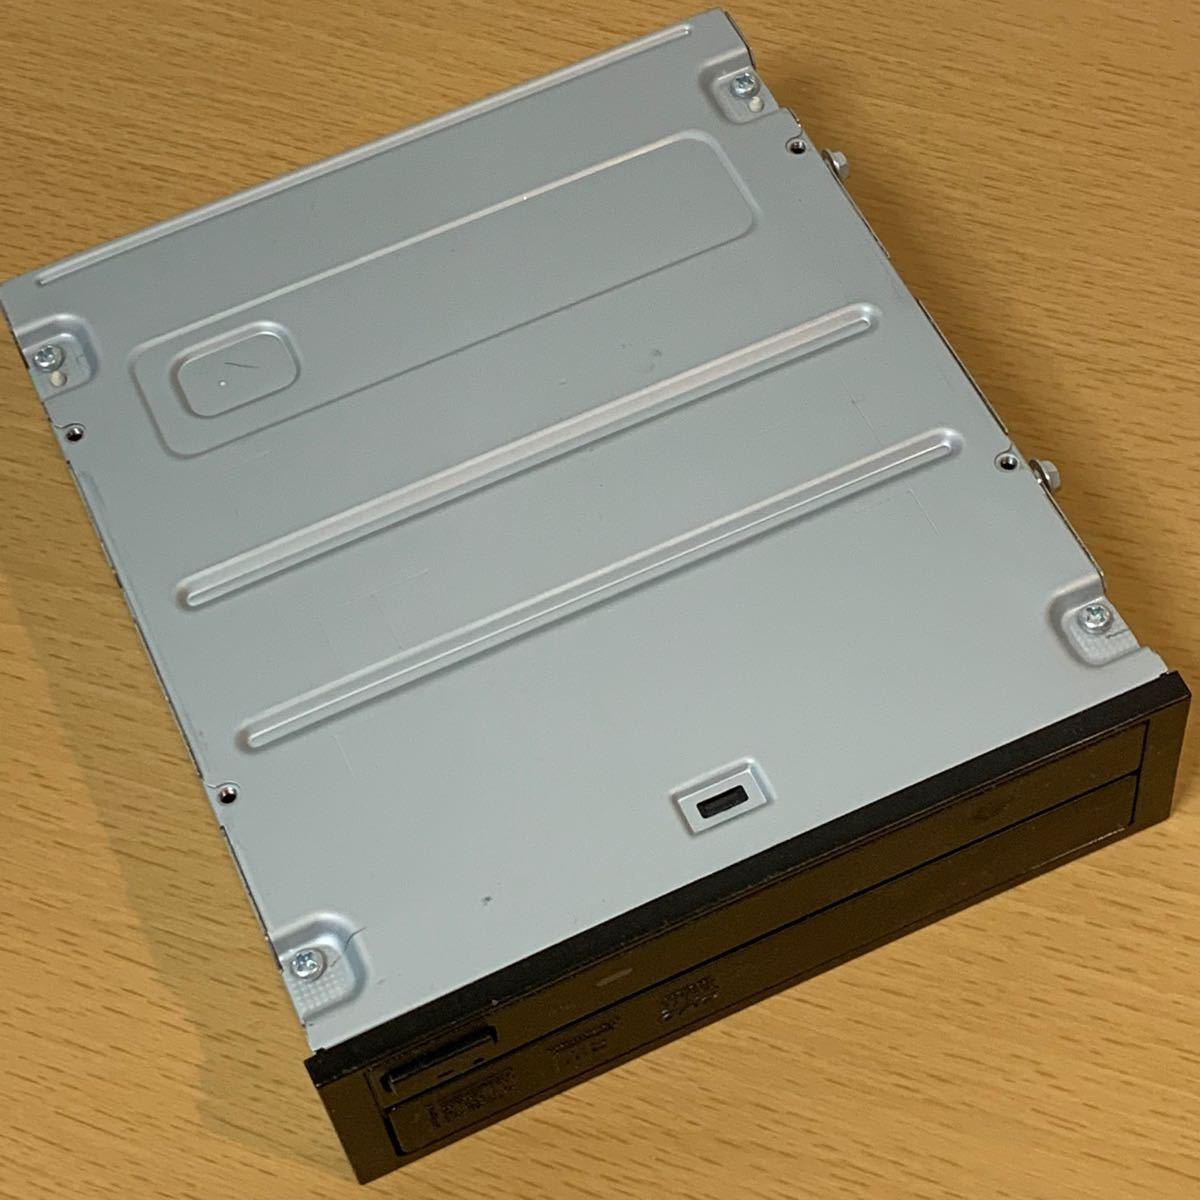 DVD/CD マルチドライブ Philips&Liteon DH-16ABS  Win10上動作確認